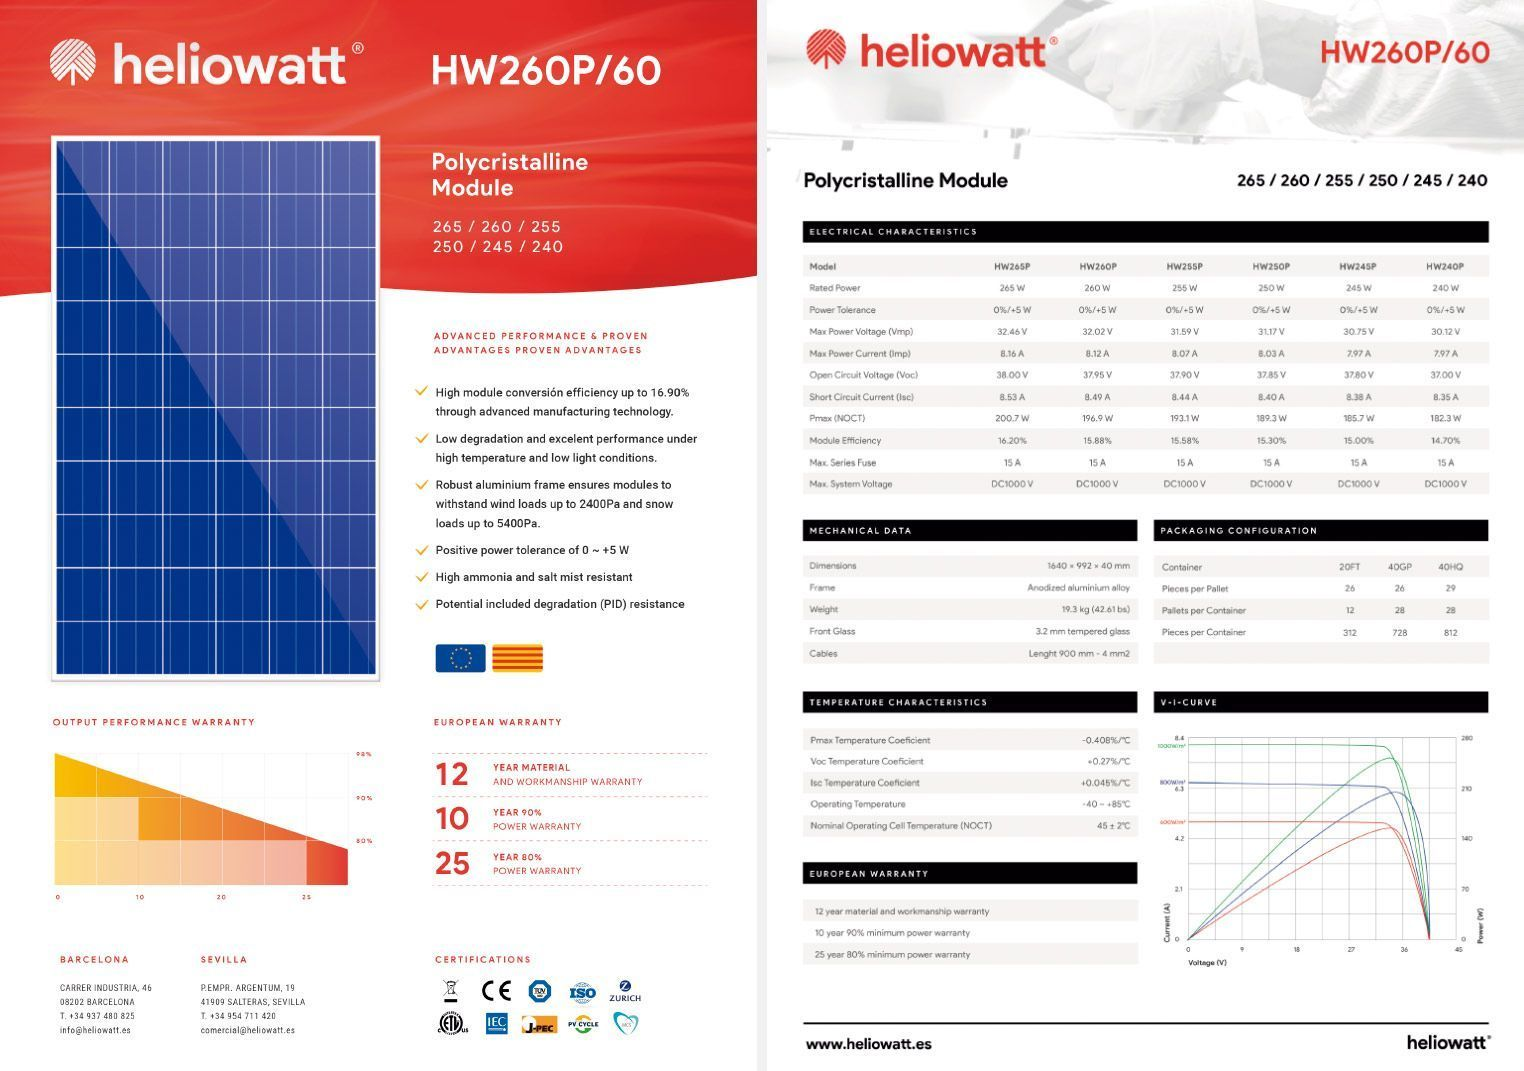 heliowatt datasheet